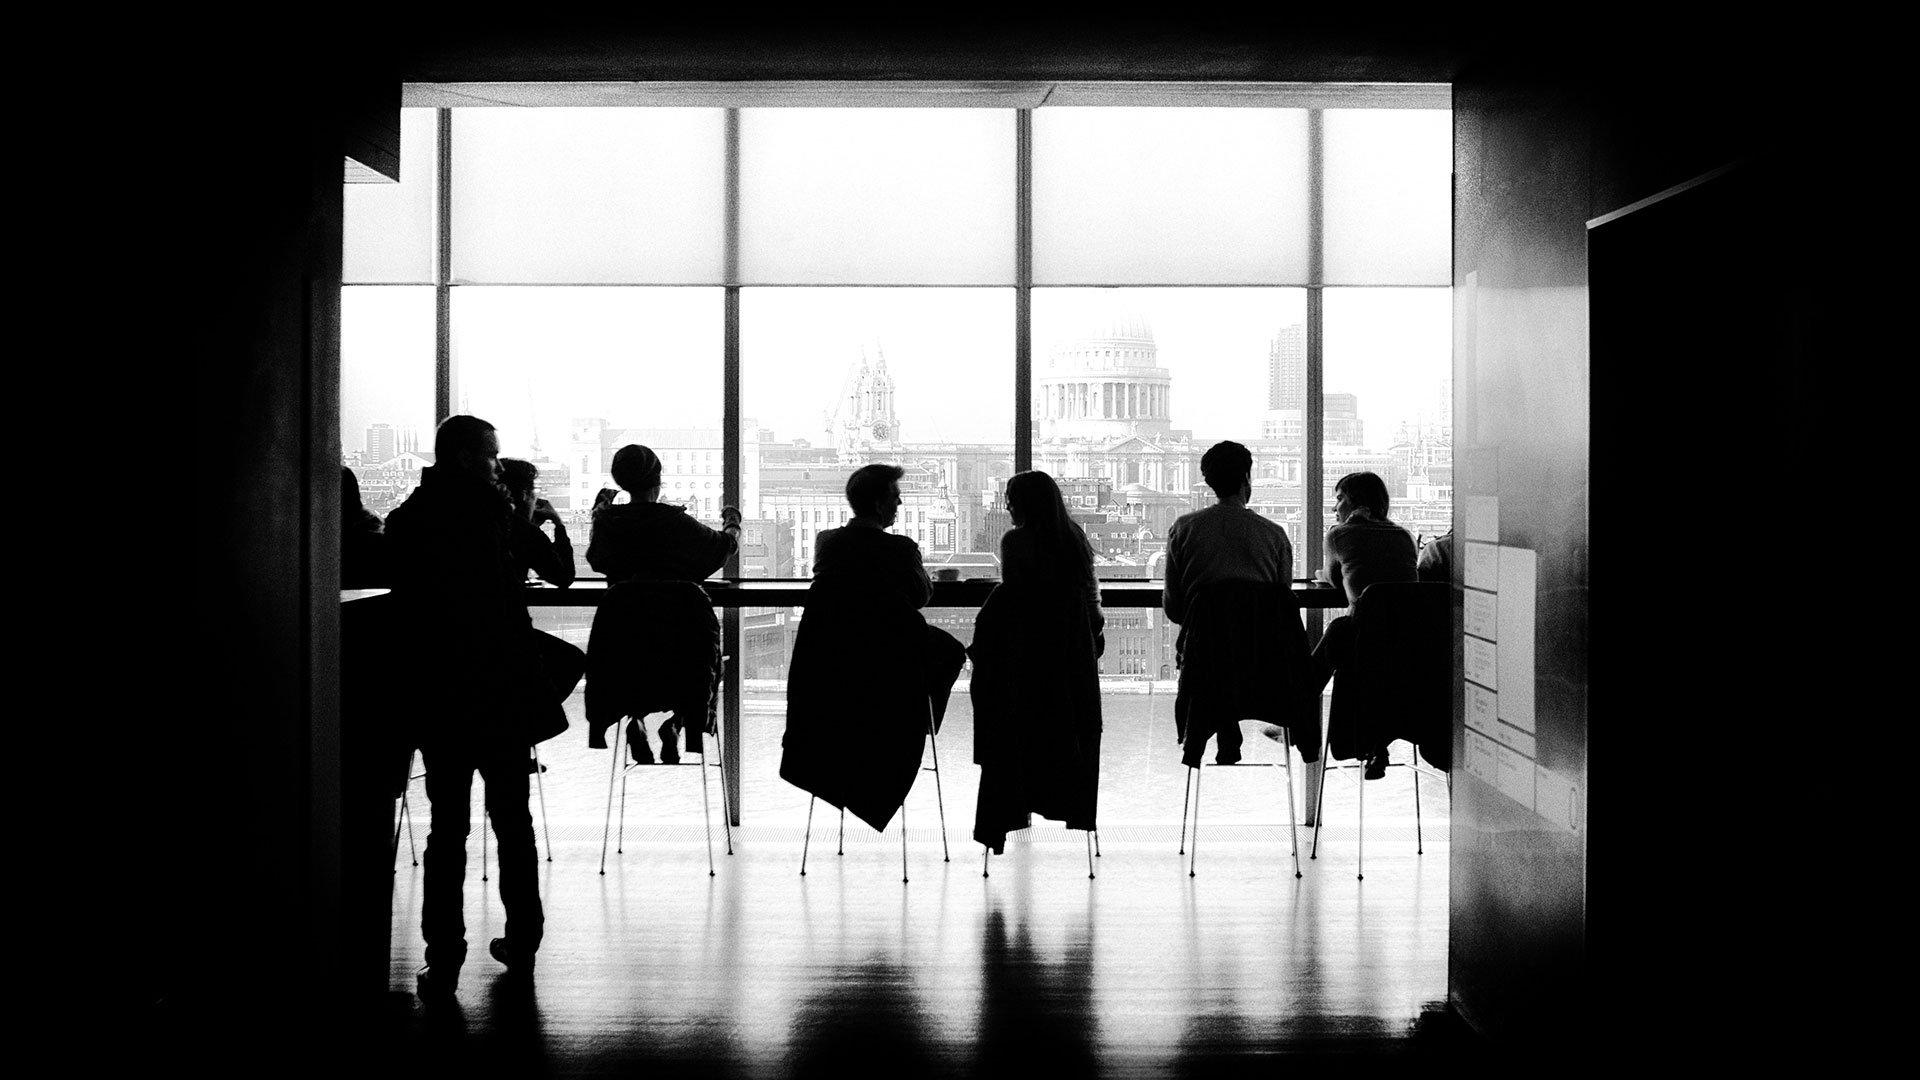 The Misunderstandings Between Millennials & Older Generations in the Workplace